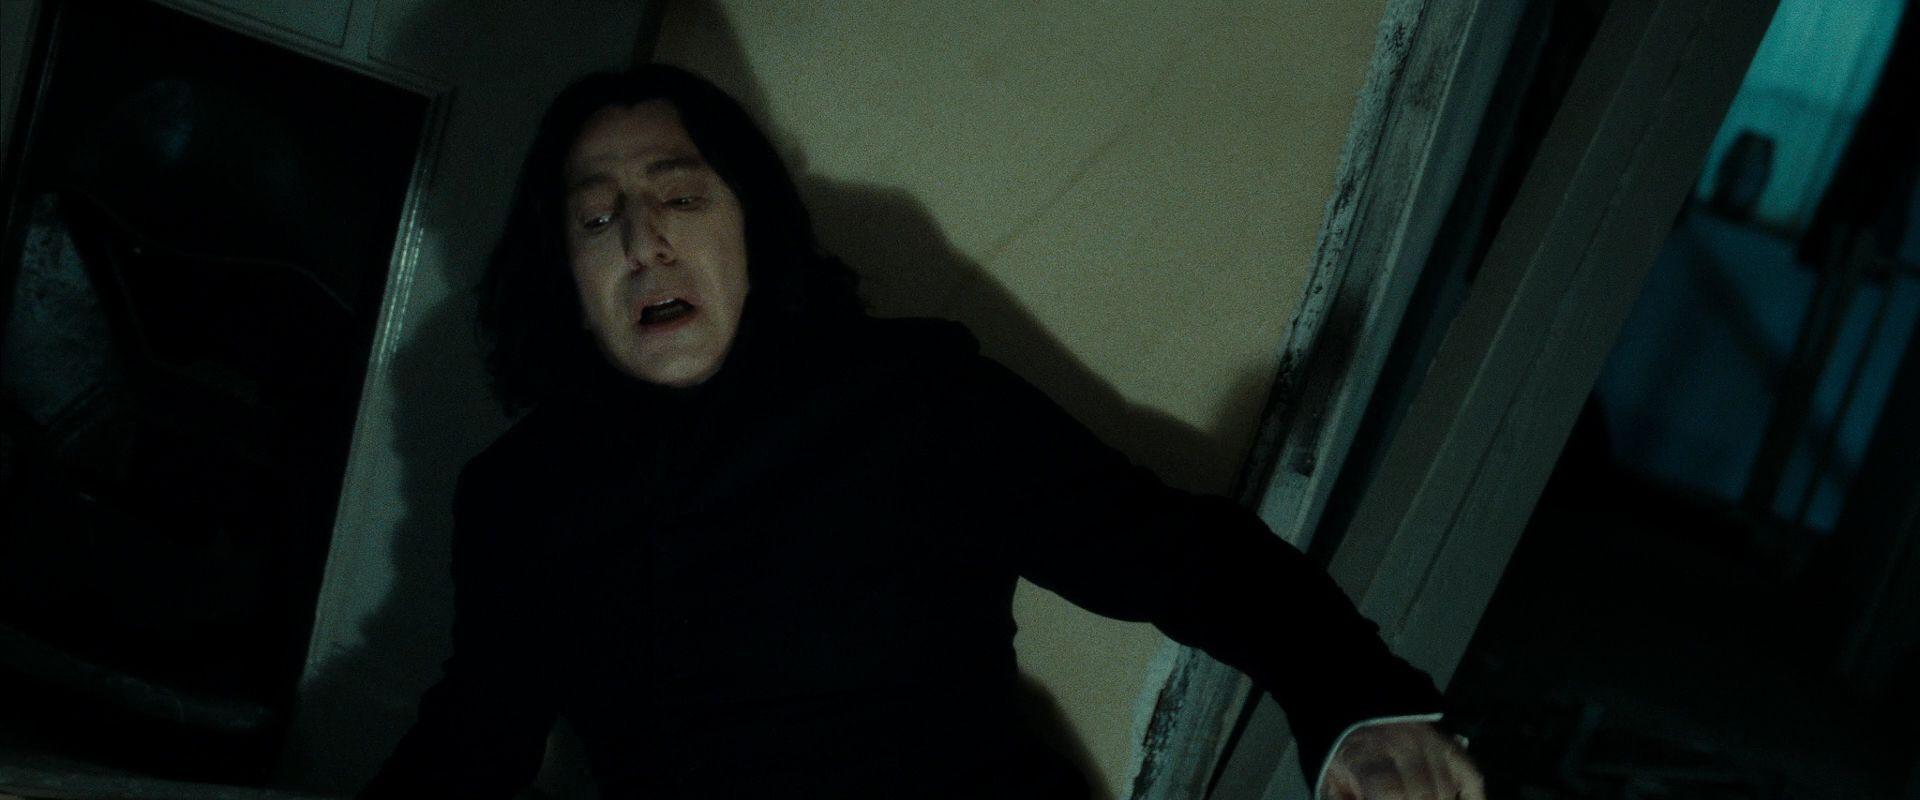 Severus Snape Lily Evans Image Harry Potter 7 Deathly Hallows Part 2 Severus Snape Severus Snape Lily Evans Alan Rickman Movies